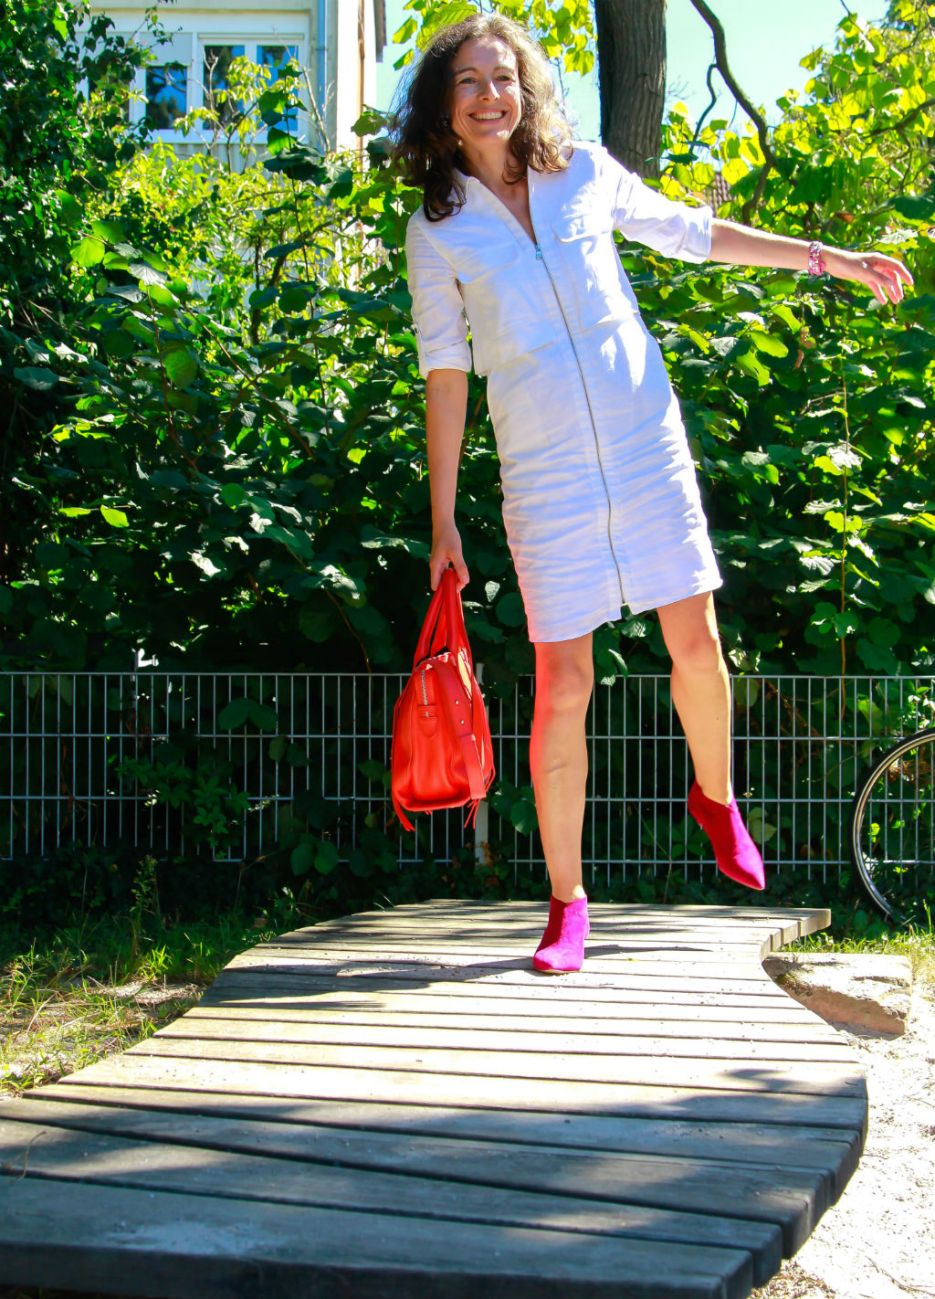 Summer-Fashion-Finaly by Anita01